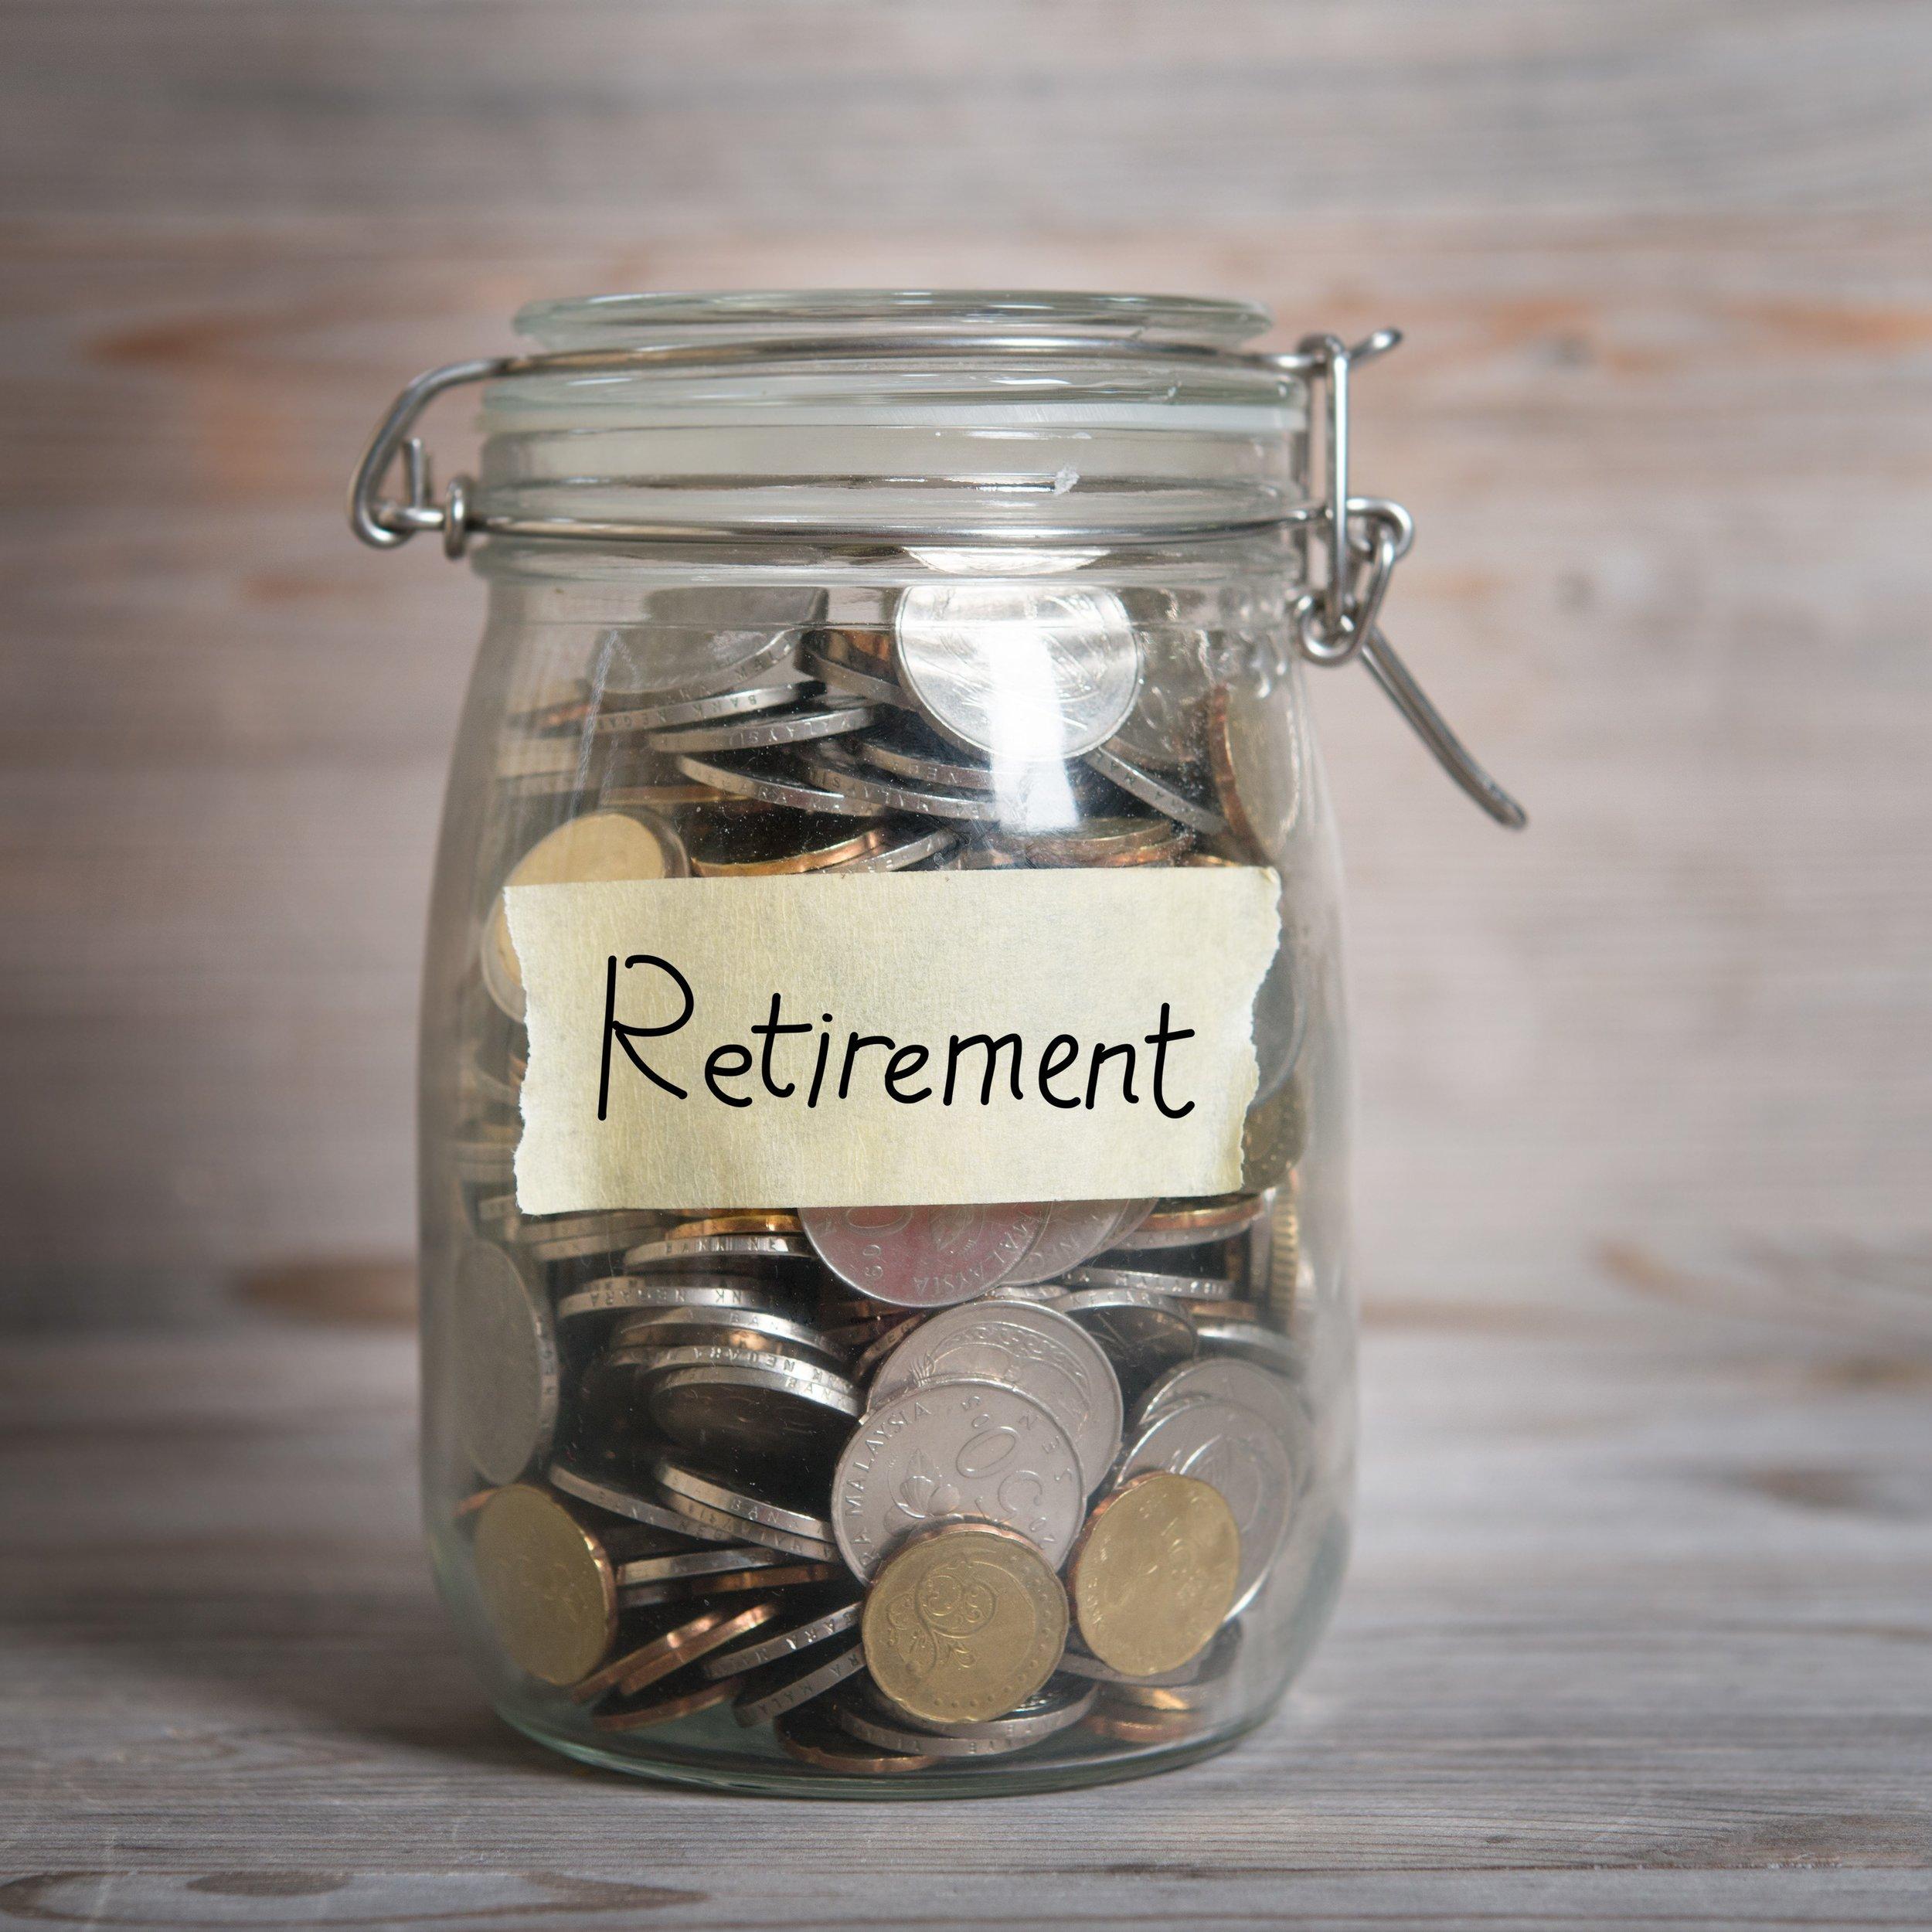 Retirement-coinjar.jpg